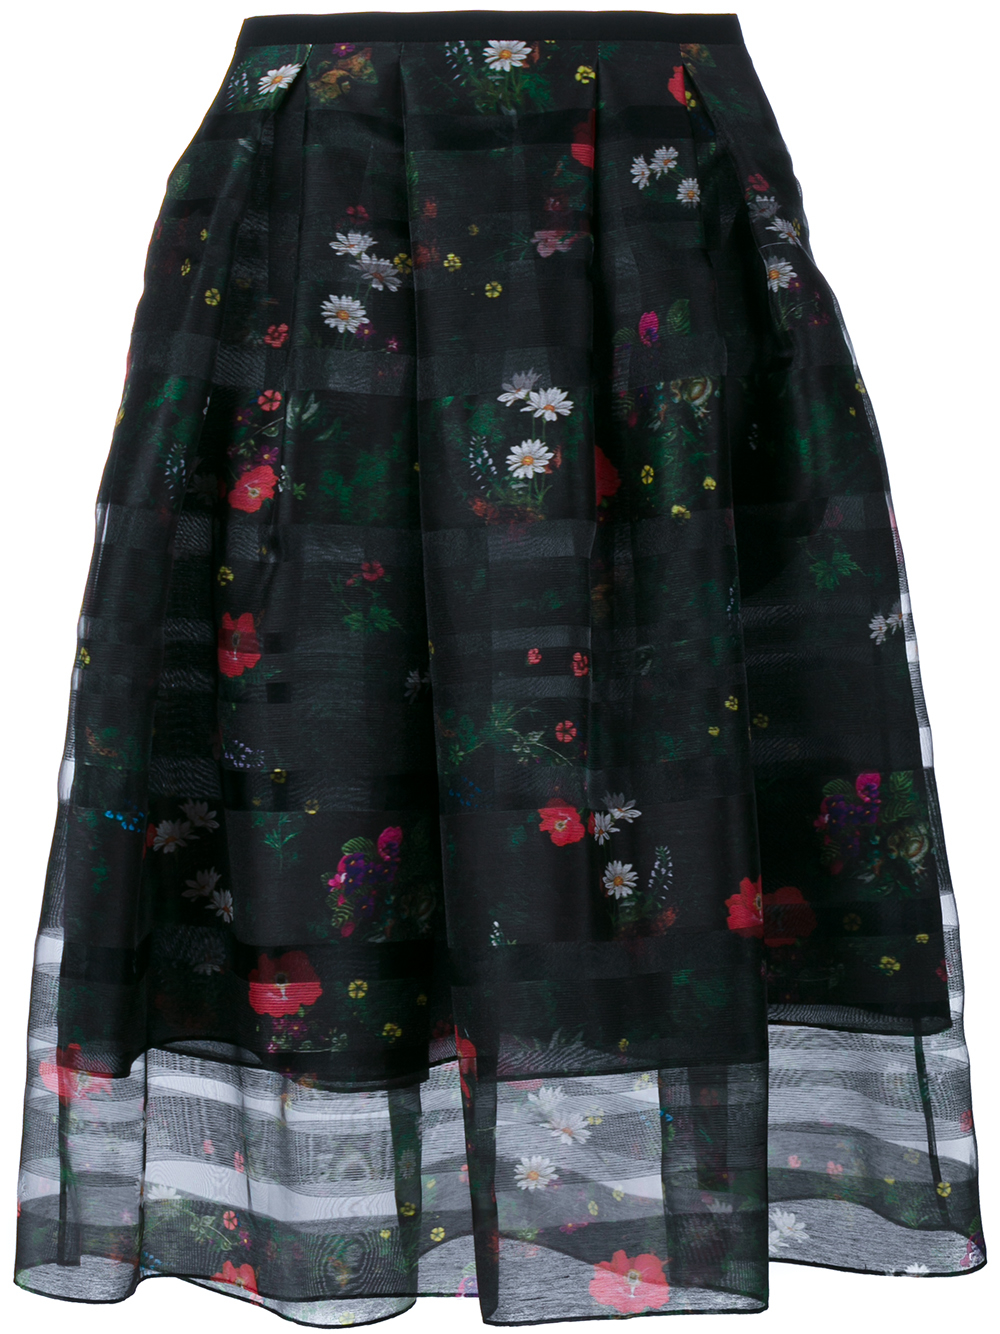 Genuine Cheap Price Erdem Ina floral skirt Sast ZvR4G